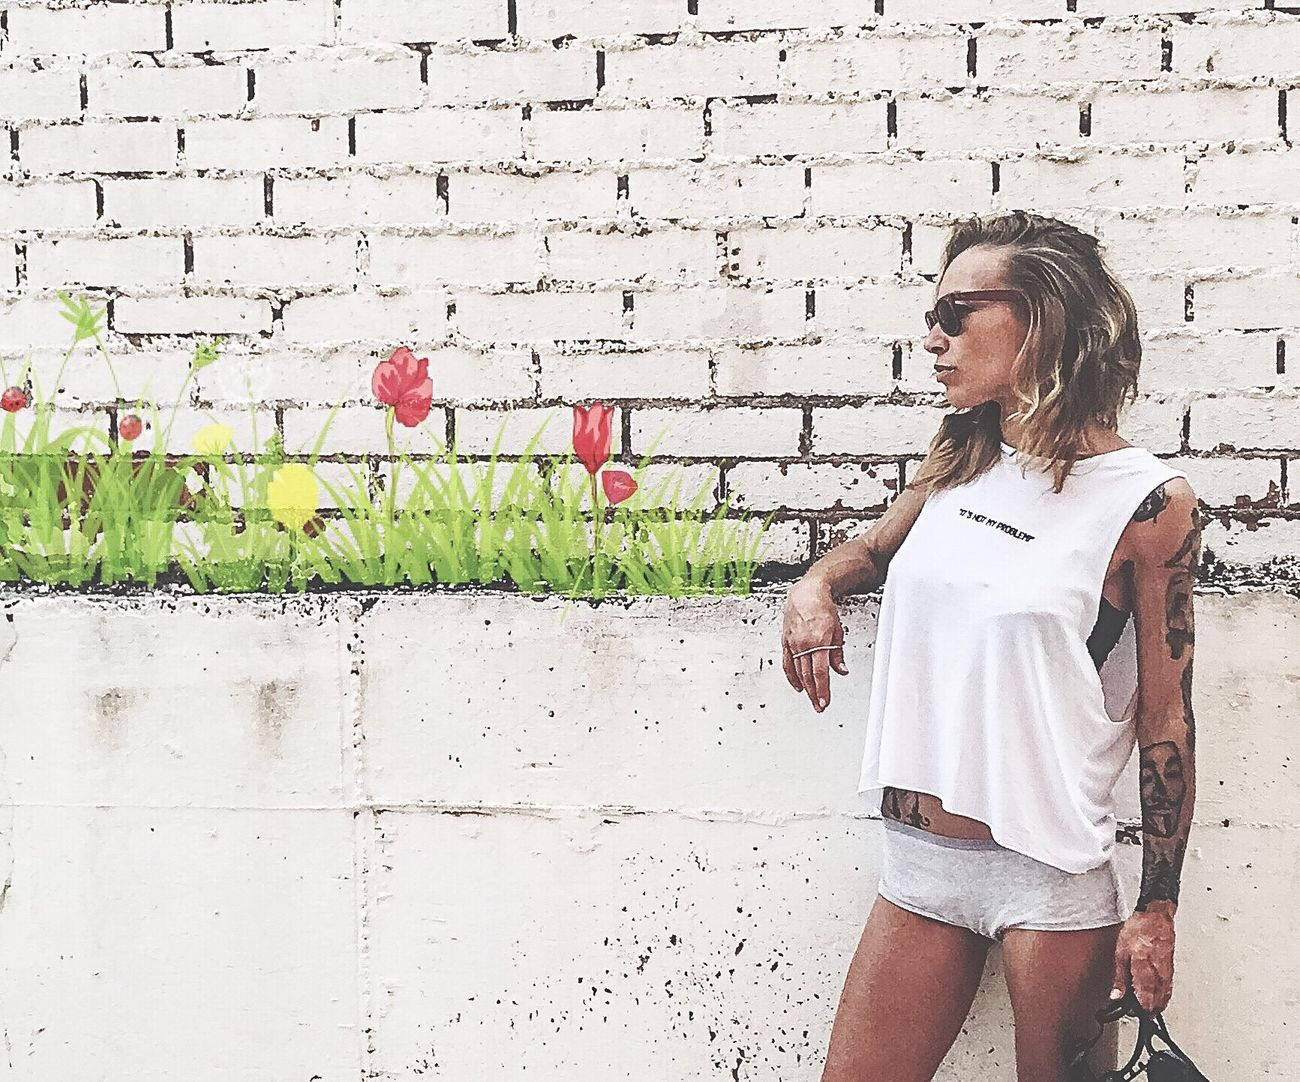 La naturaleza hizo un mundo 🌍 y el arte otro 🎨🌍 The Street Photographer - 2016 EyeEm Awards The Portraitist - 2016 EyeEm Awards Graffiti Plant Flowers Streetphotography Streetart Tattoo Taking Photos Iphone6s IPhoneography White Wall Painting Summer Girl Power